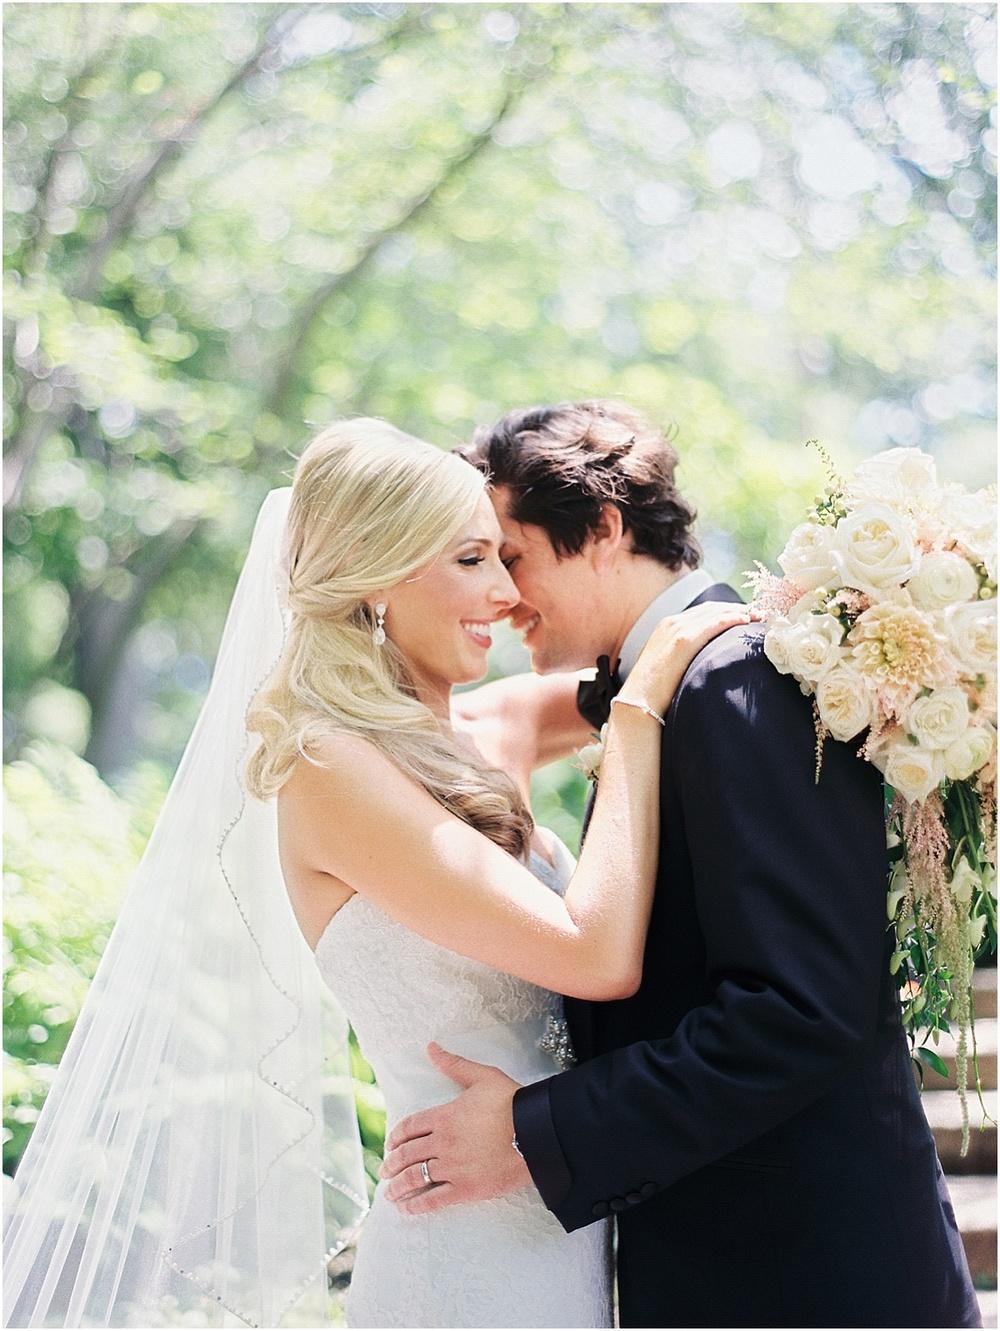 St_Louis_Wedding_Fine_Art_Film_Photographer_Jordan_Brittley_(www.jordanbrittley.com)_0014.jpg